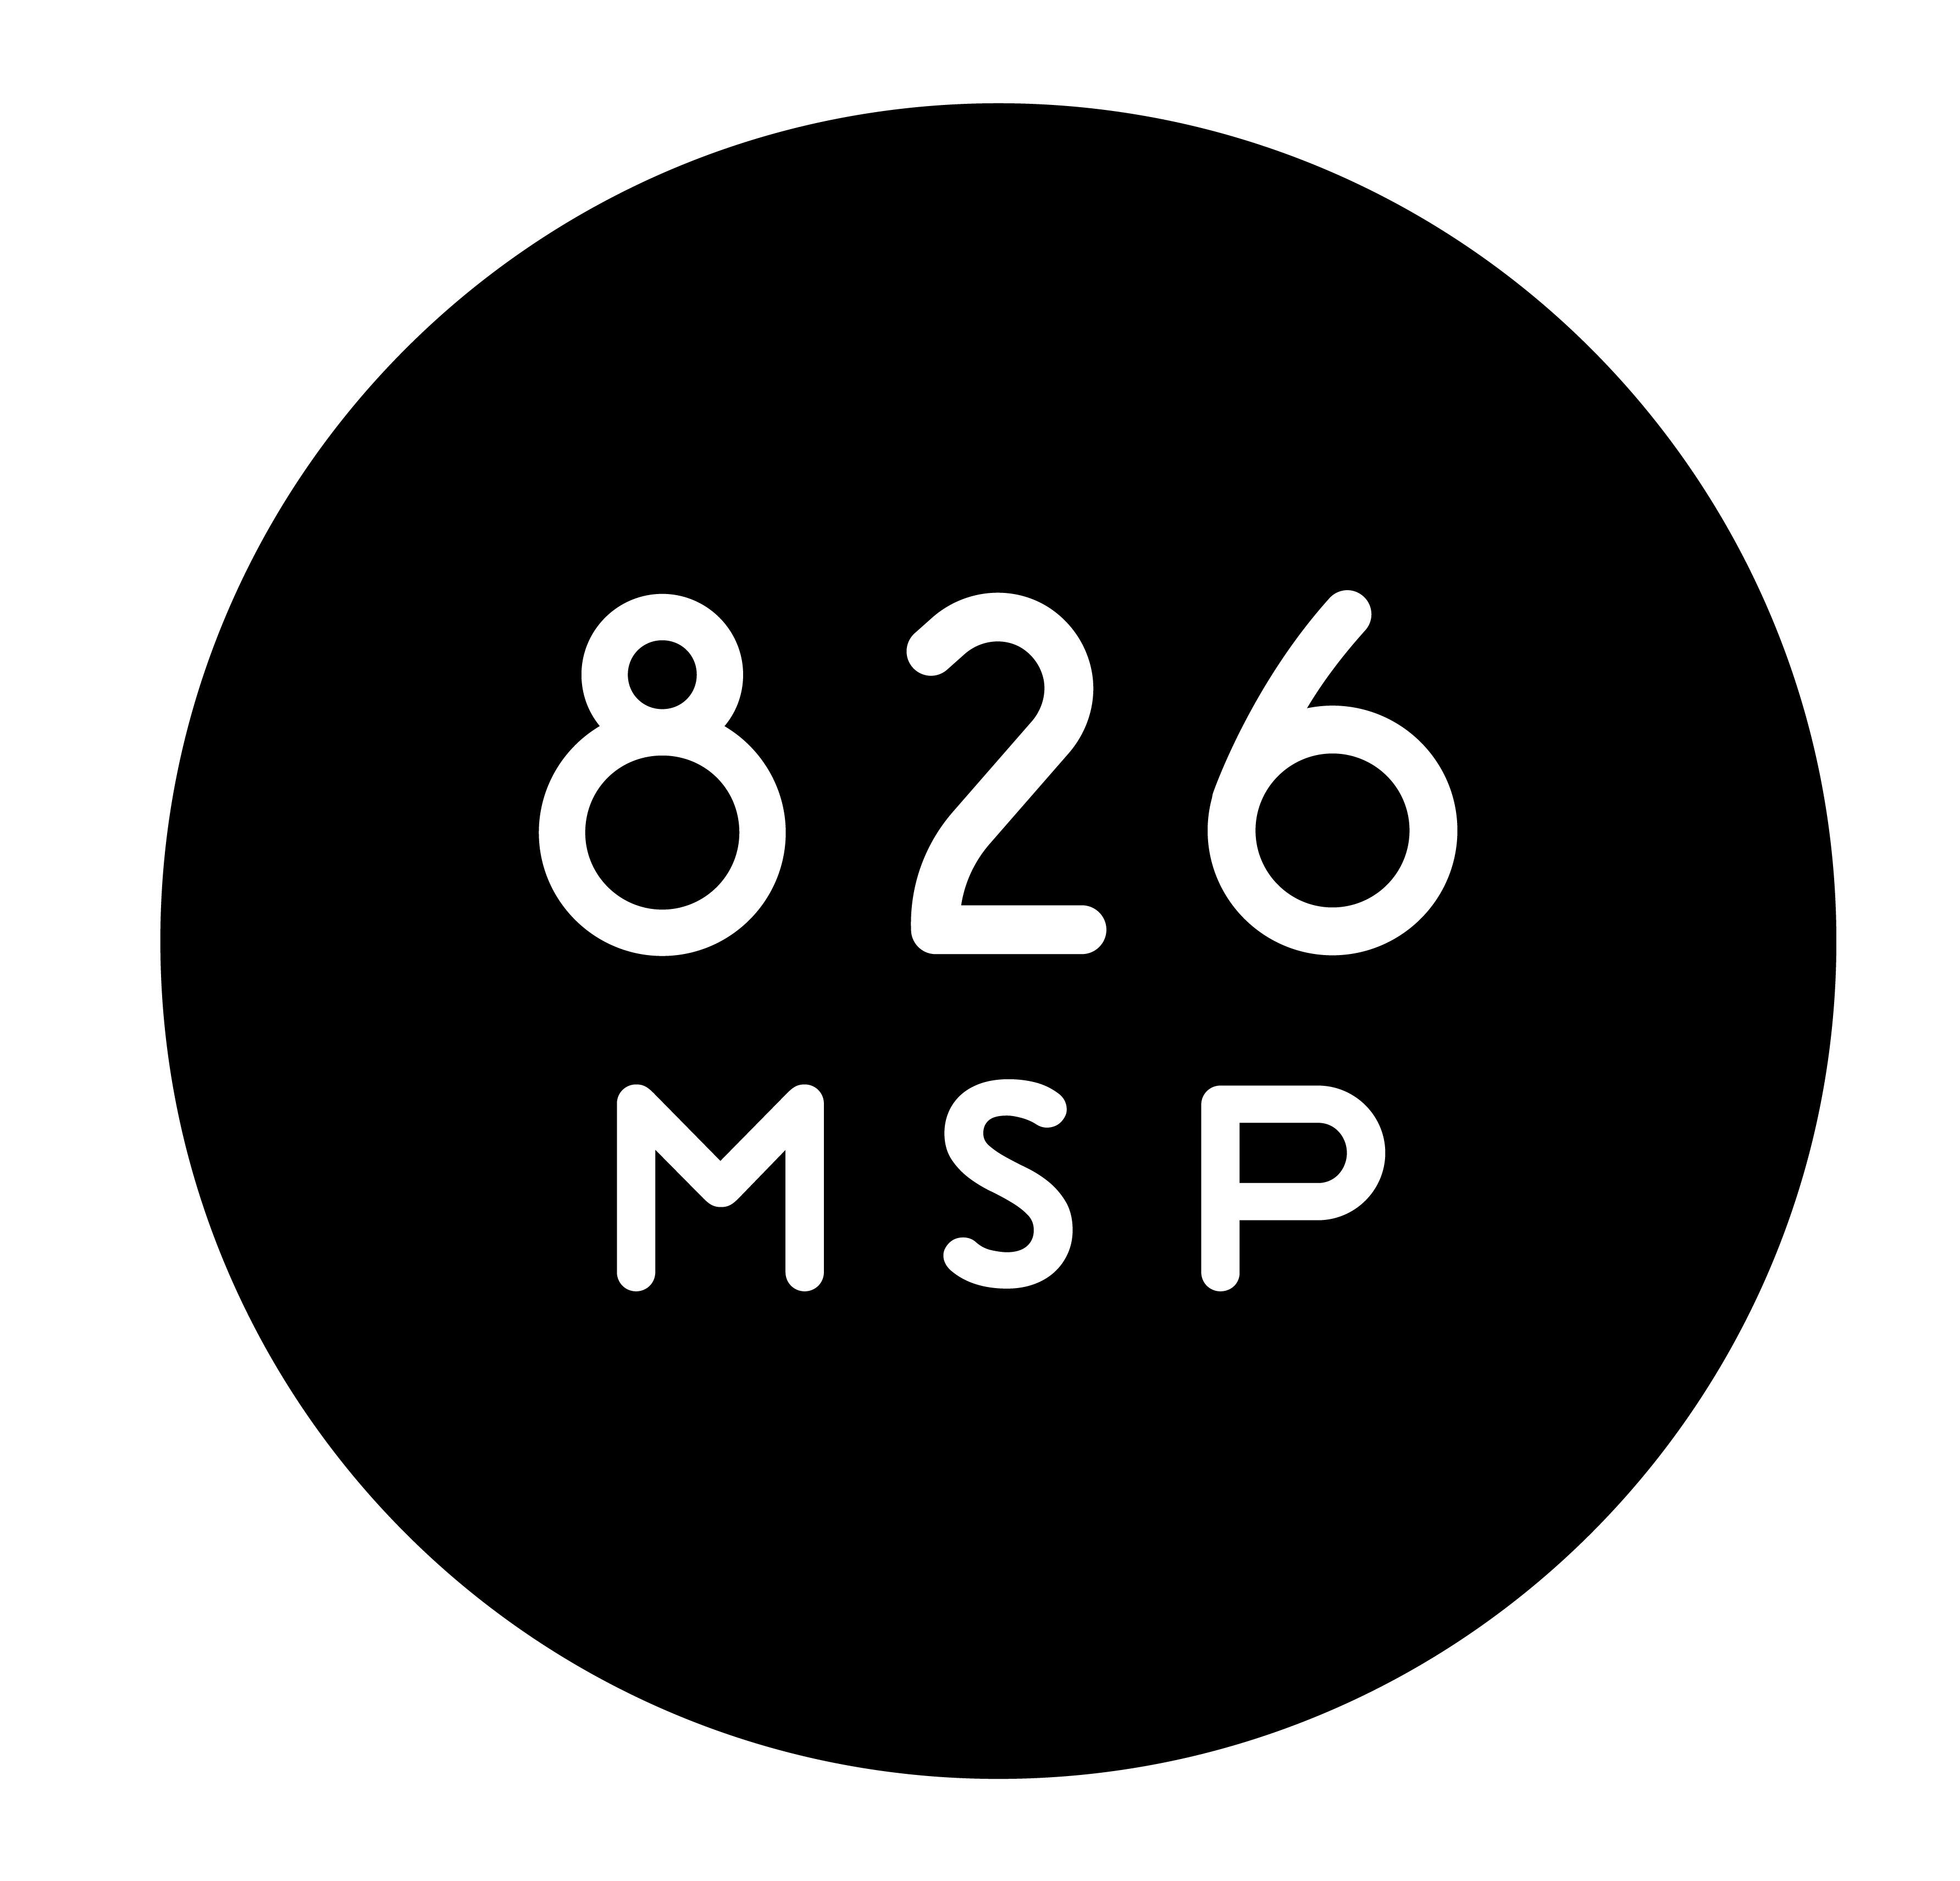 826MSP logo